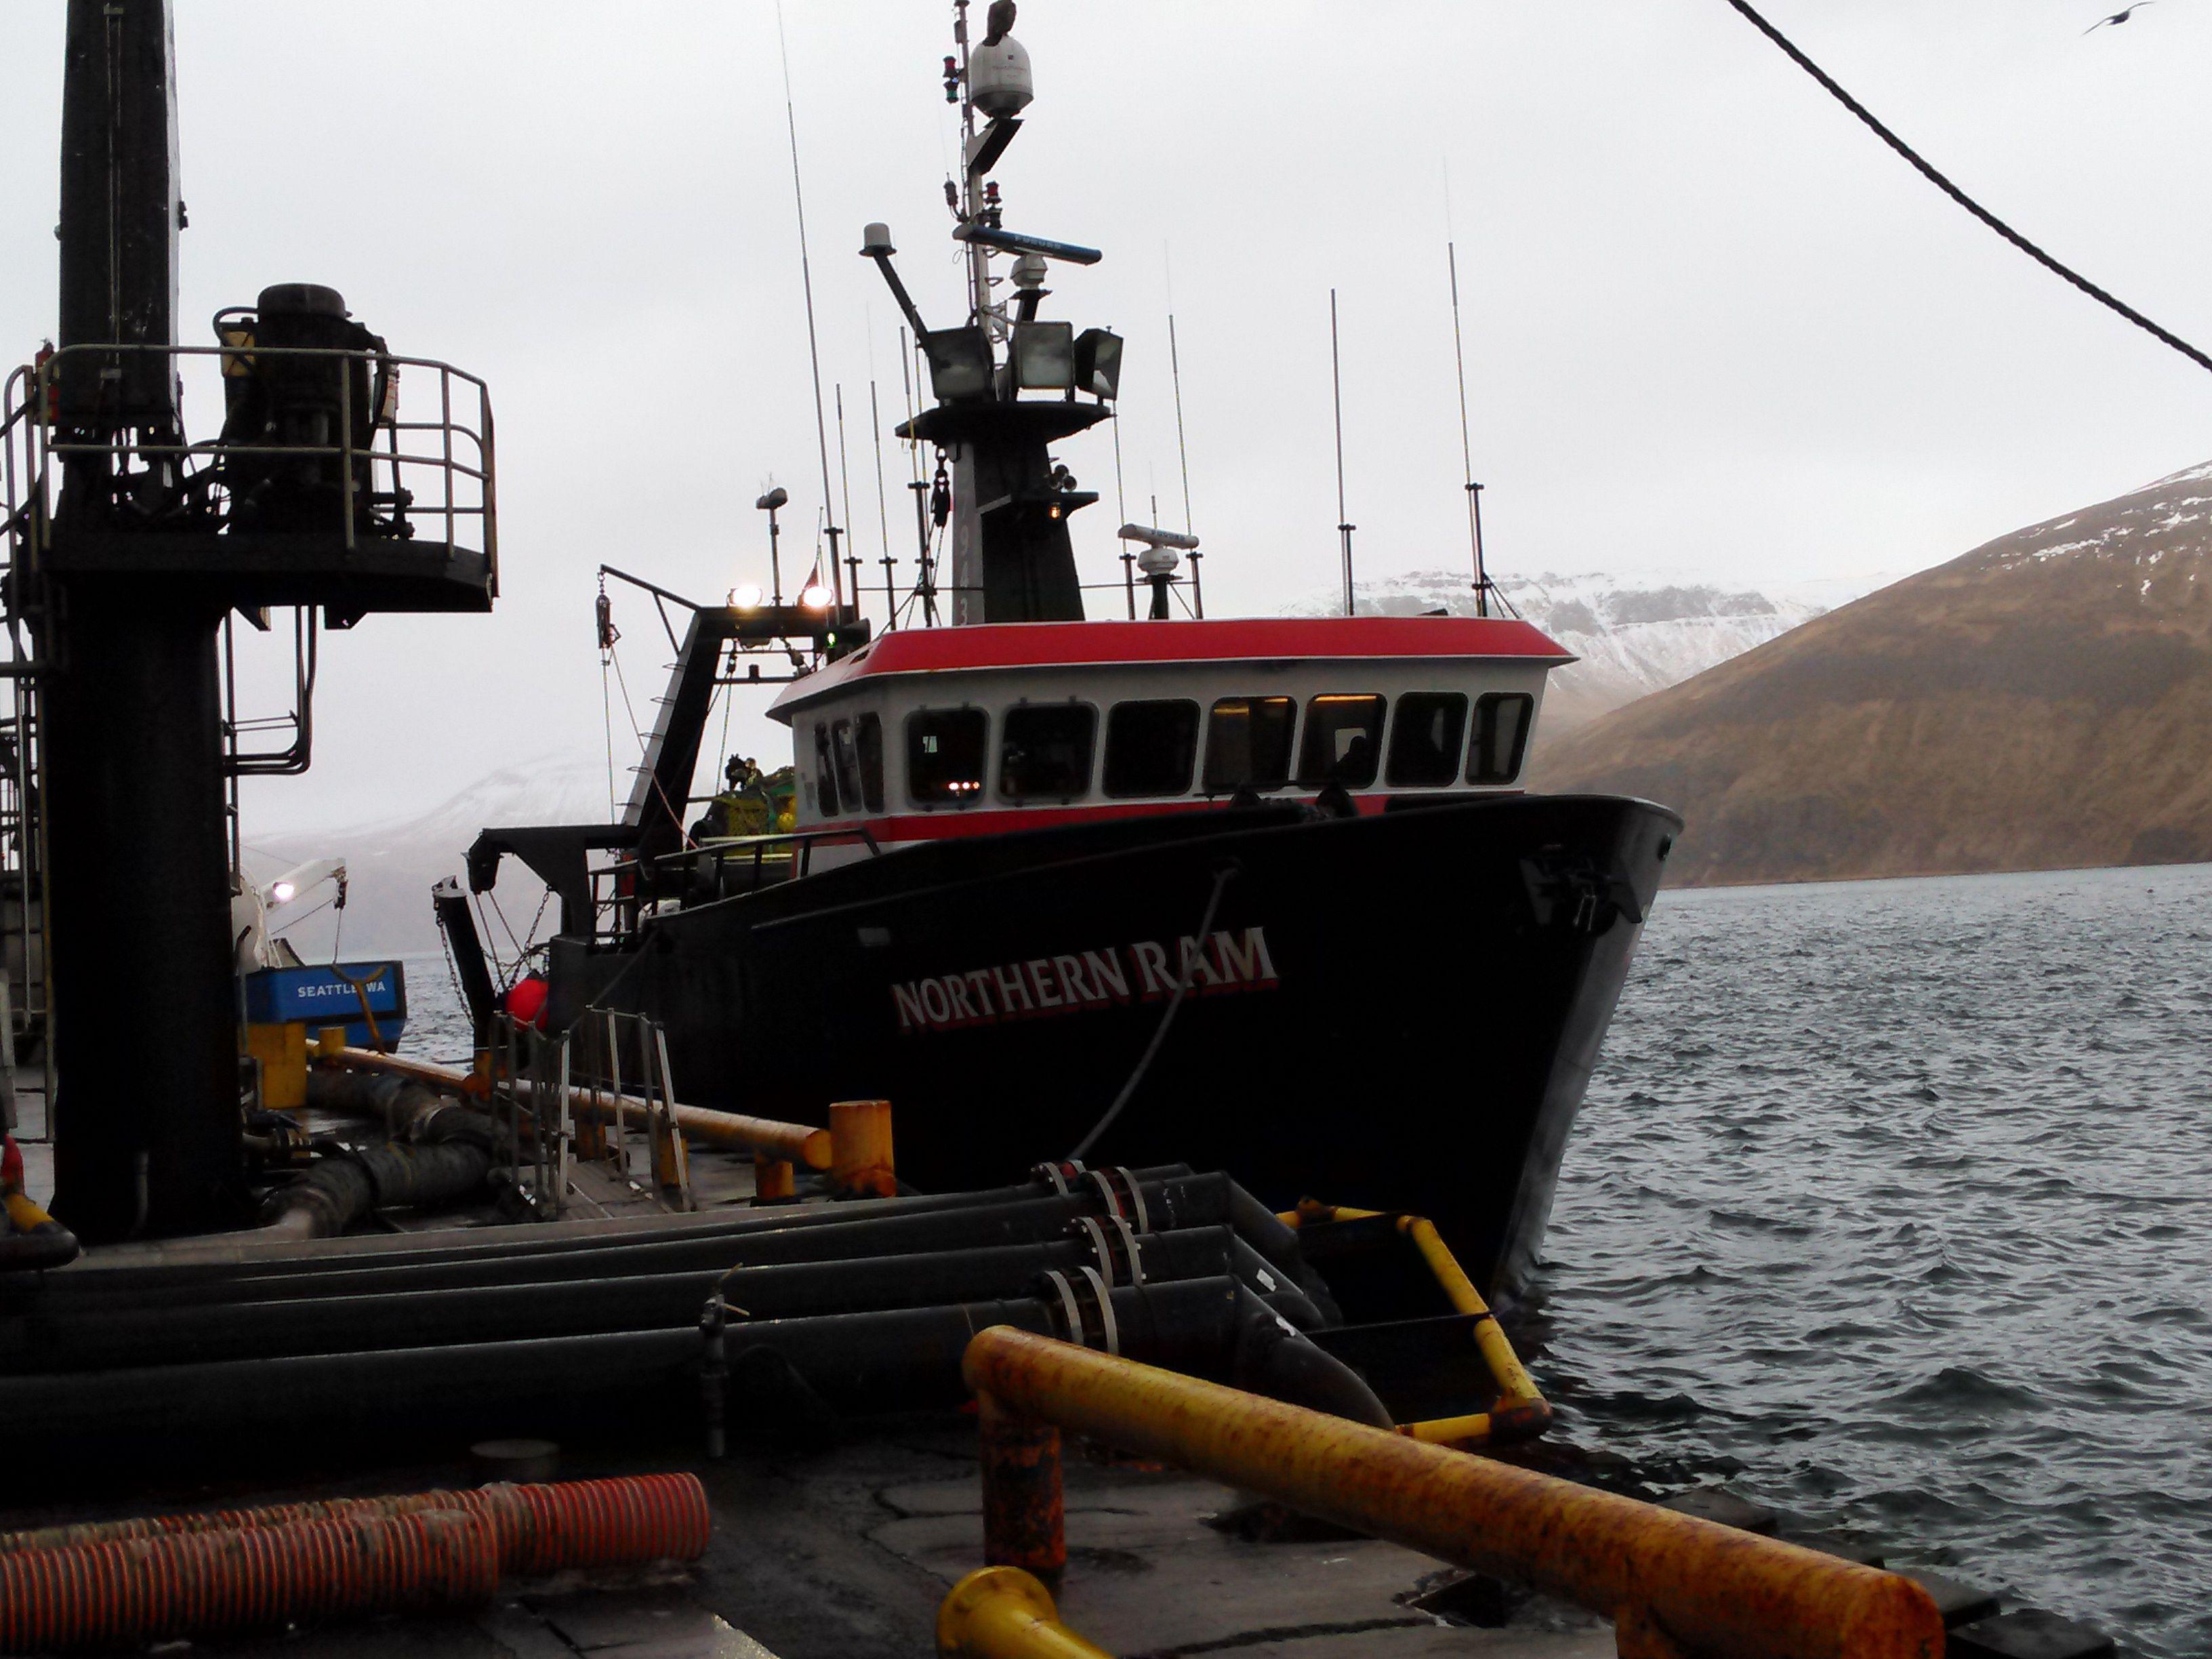 F/V NORTHERN RAM Fishing boats, Boat, Alaska